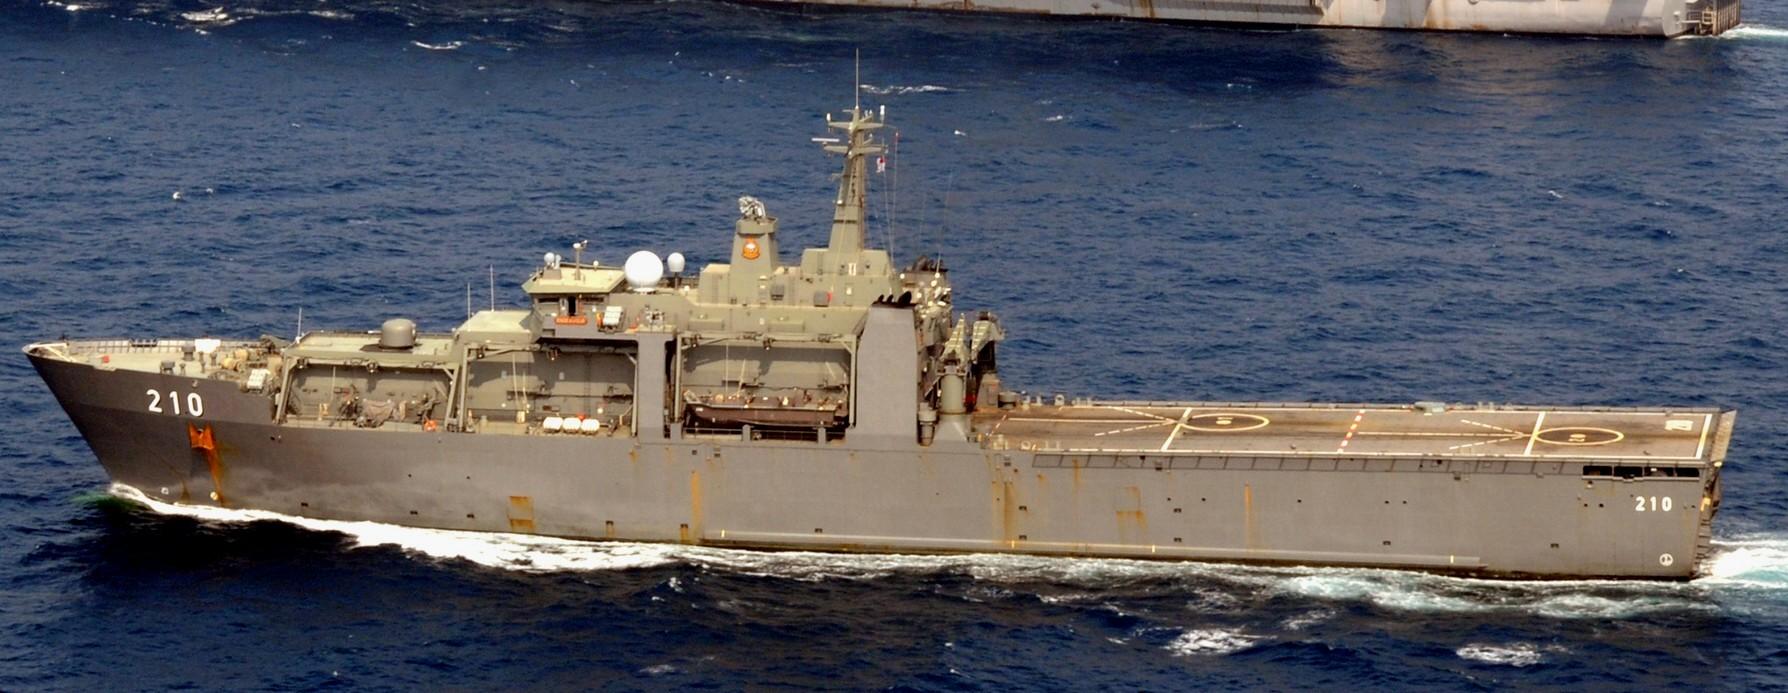 http://www.seaforces.org/marint/Singapore-Navy/Amphibious-Ship/210-RSS-Endeavour-photo-002.jpg